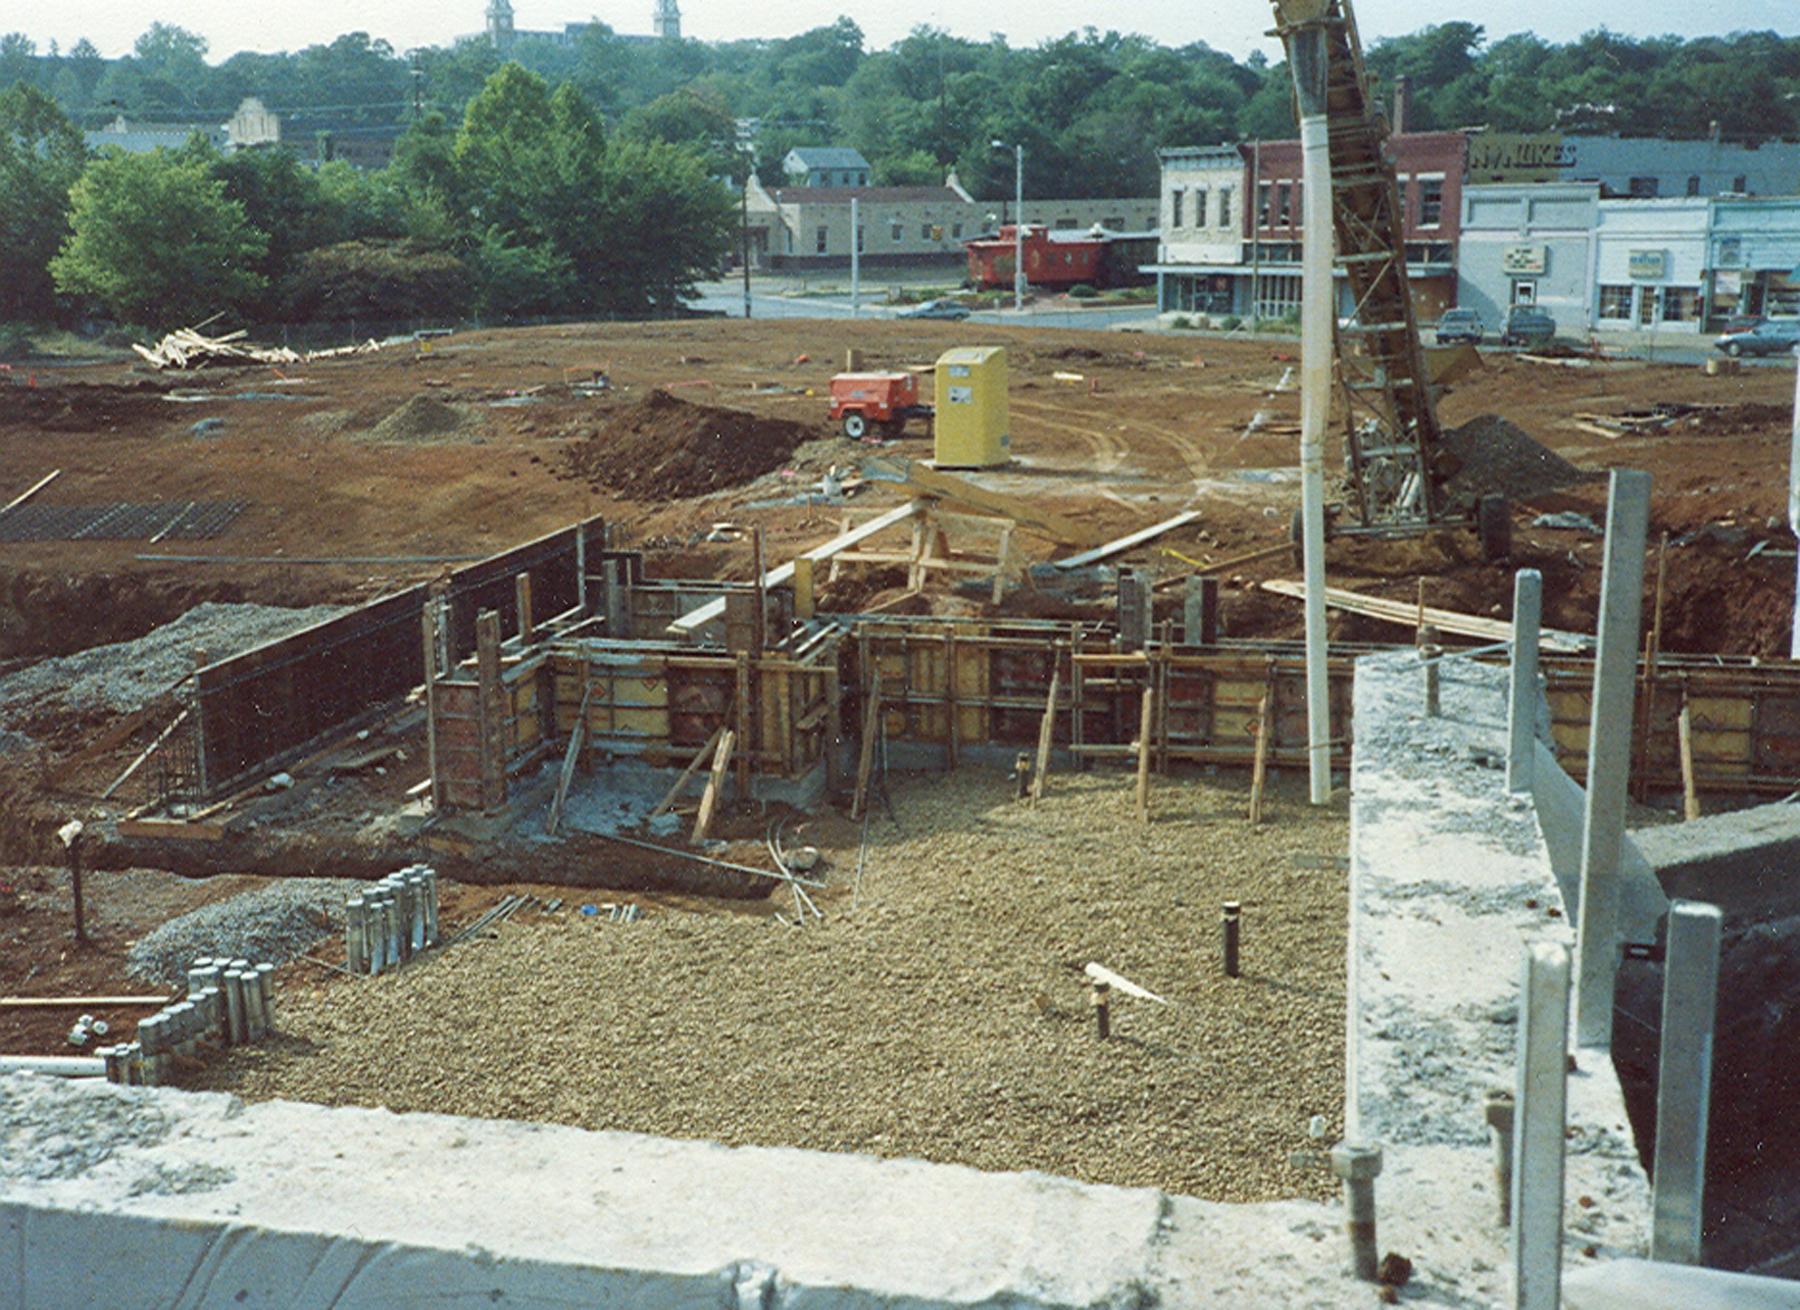 Construction of Walton Arts Center in 1991